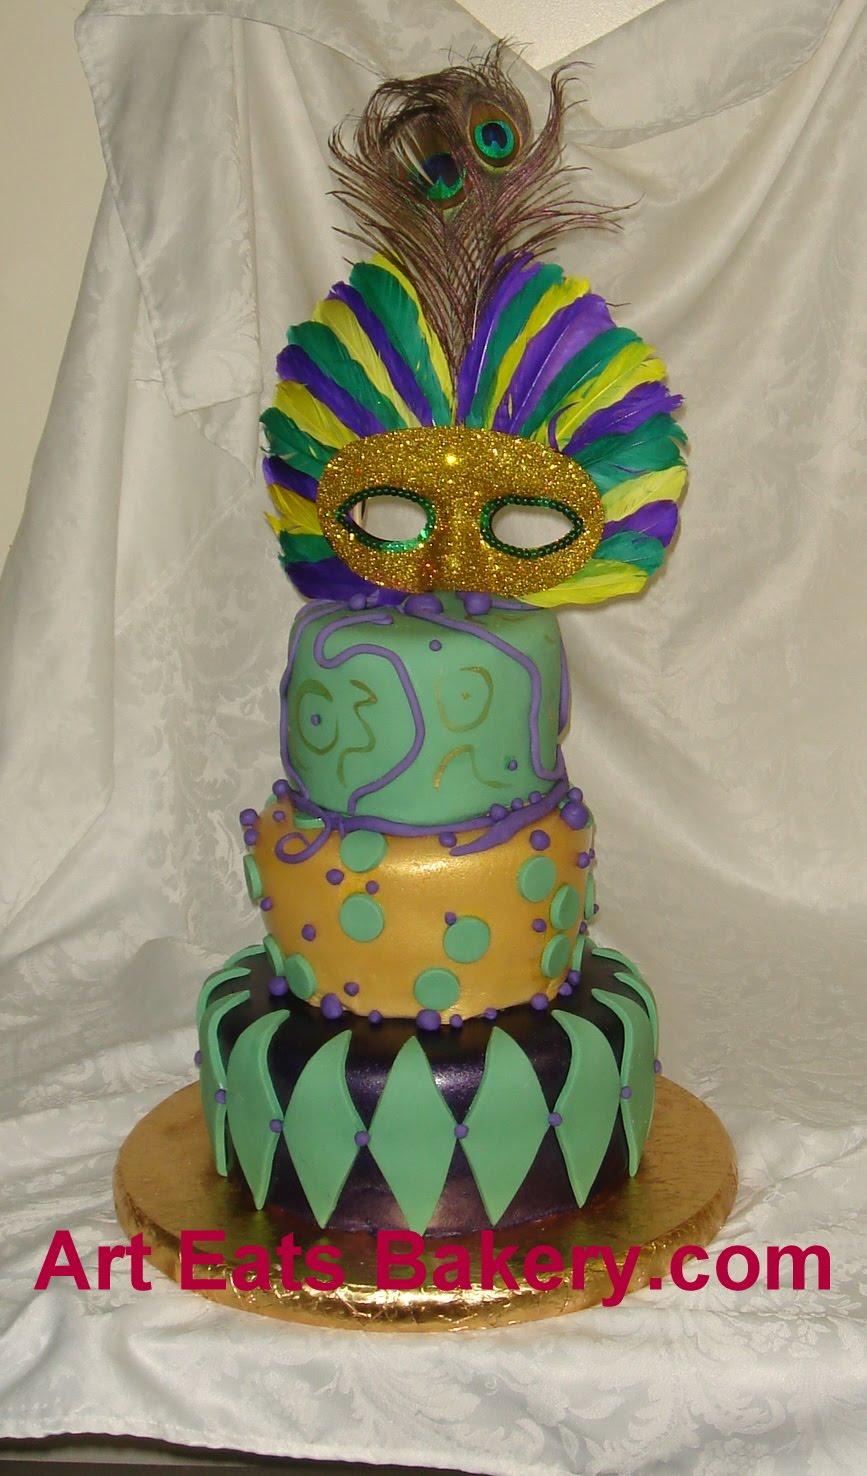 Art Eats Bakery custom fondant wedding and birthday cake designs ...